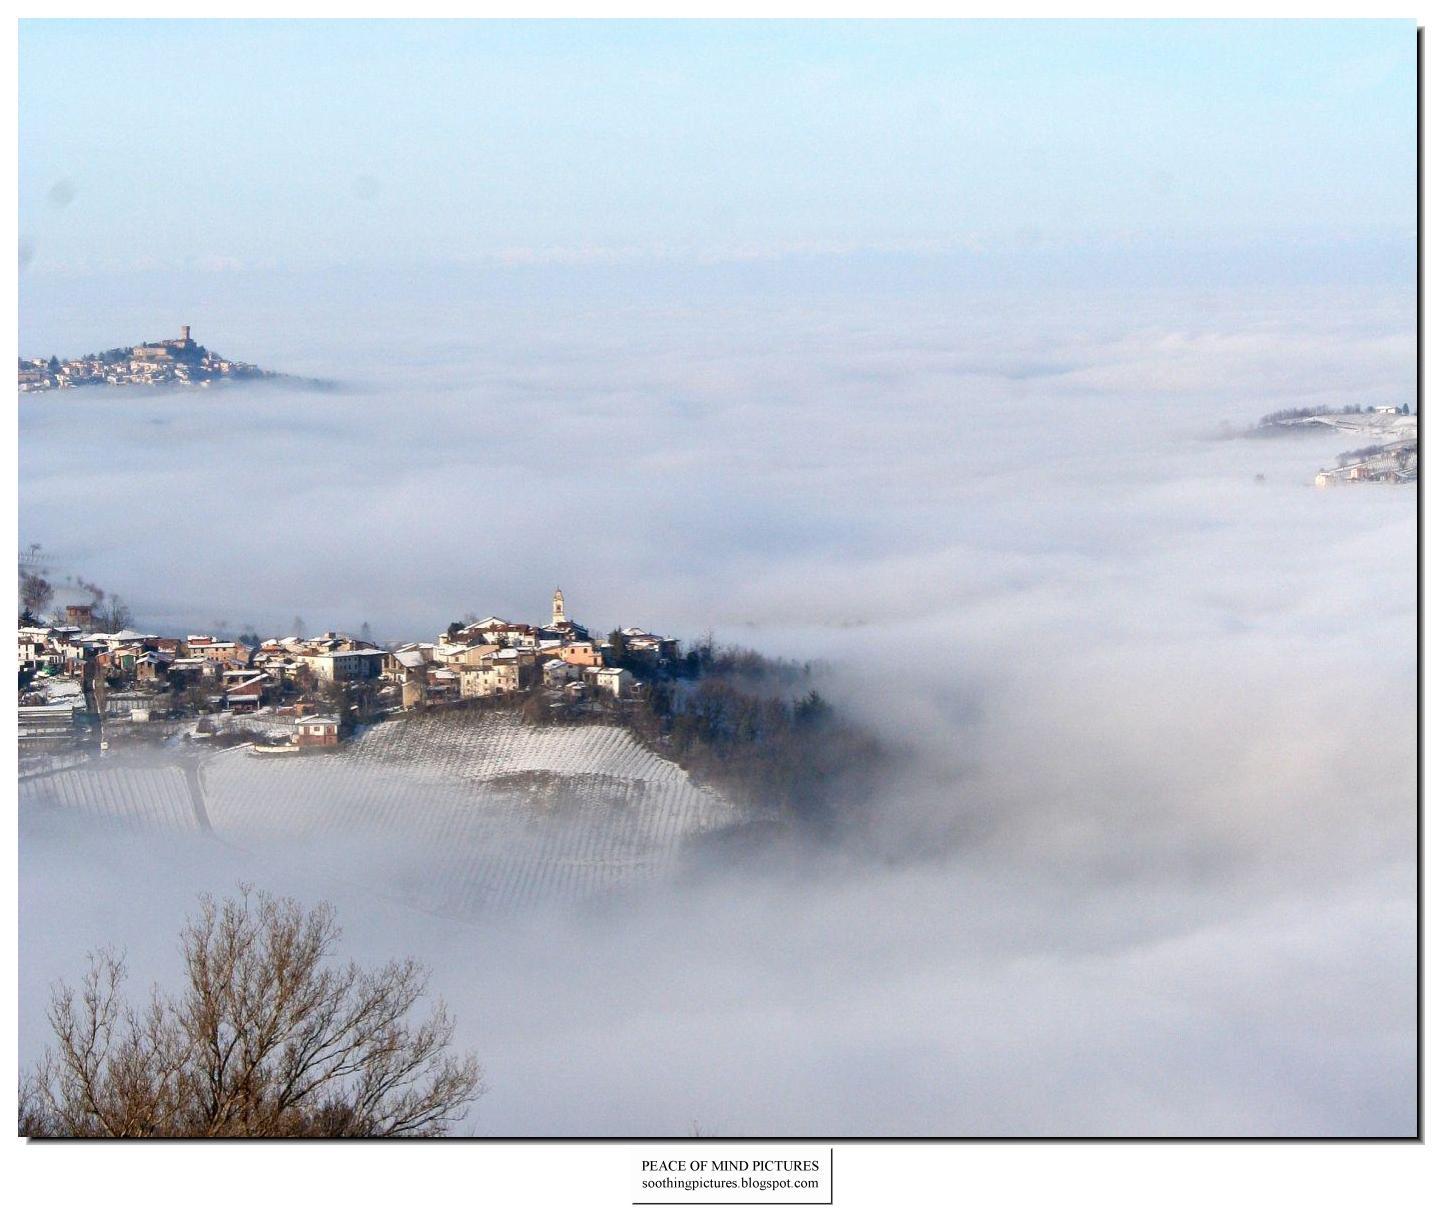 http://2.bp.blogspot.com/_8KMrX6Wq1ko/TLcU1I31qzI/AAAAAAAAH6I/6bDX9UkiIyw/s1600/peace-of-mind-pictures-fog-010.jpg